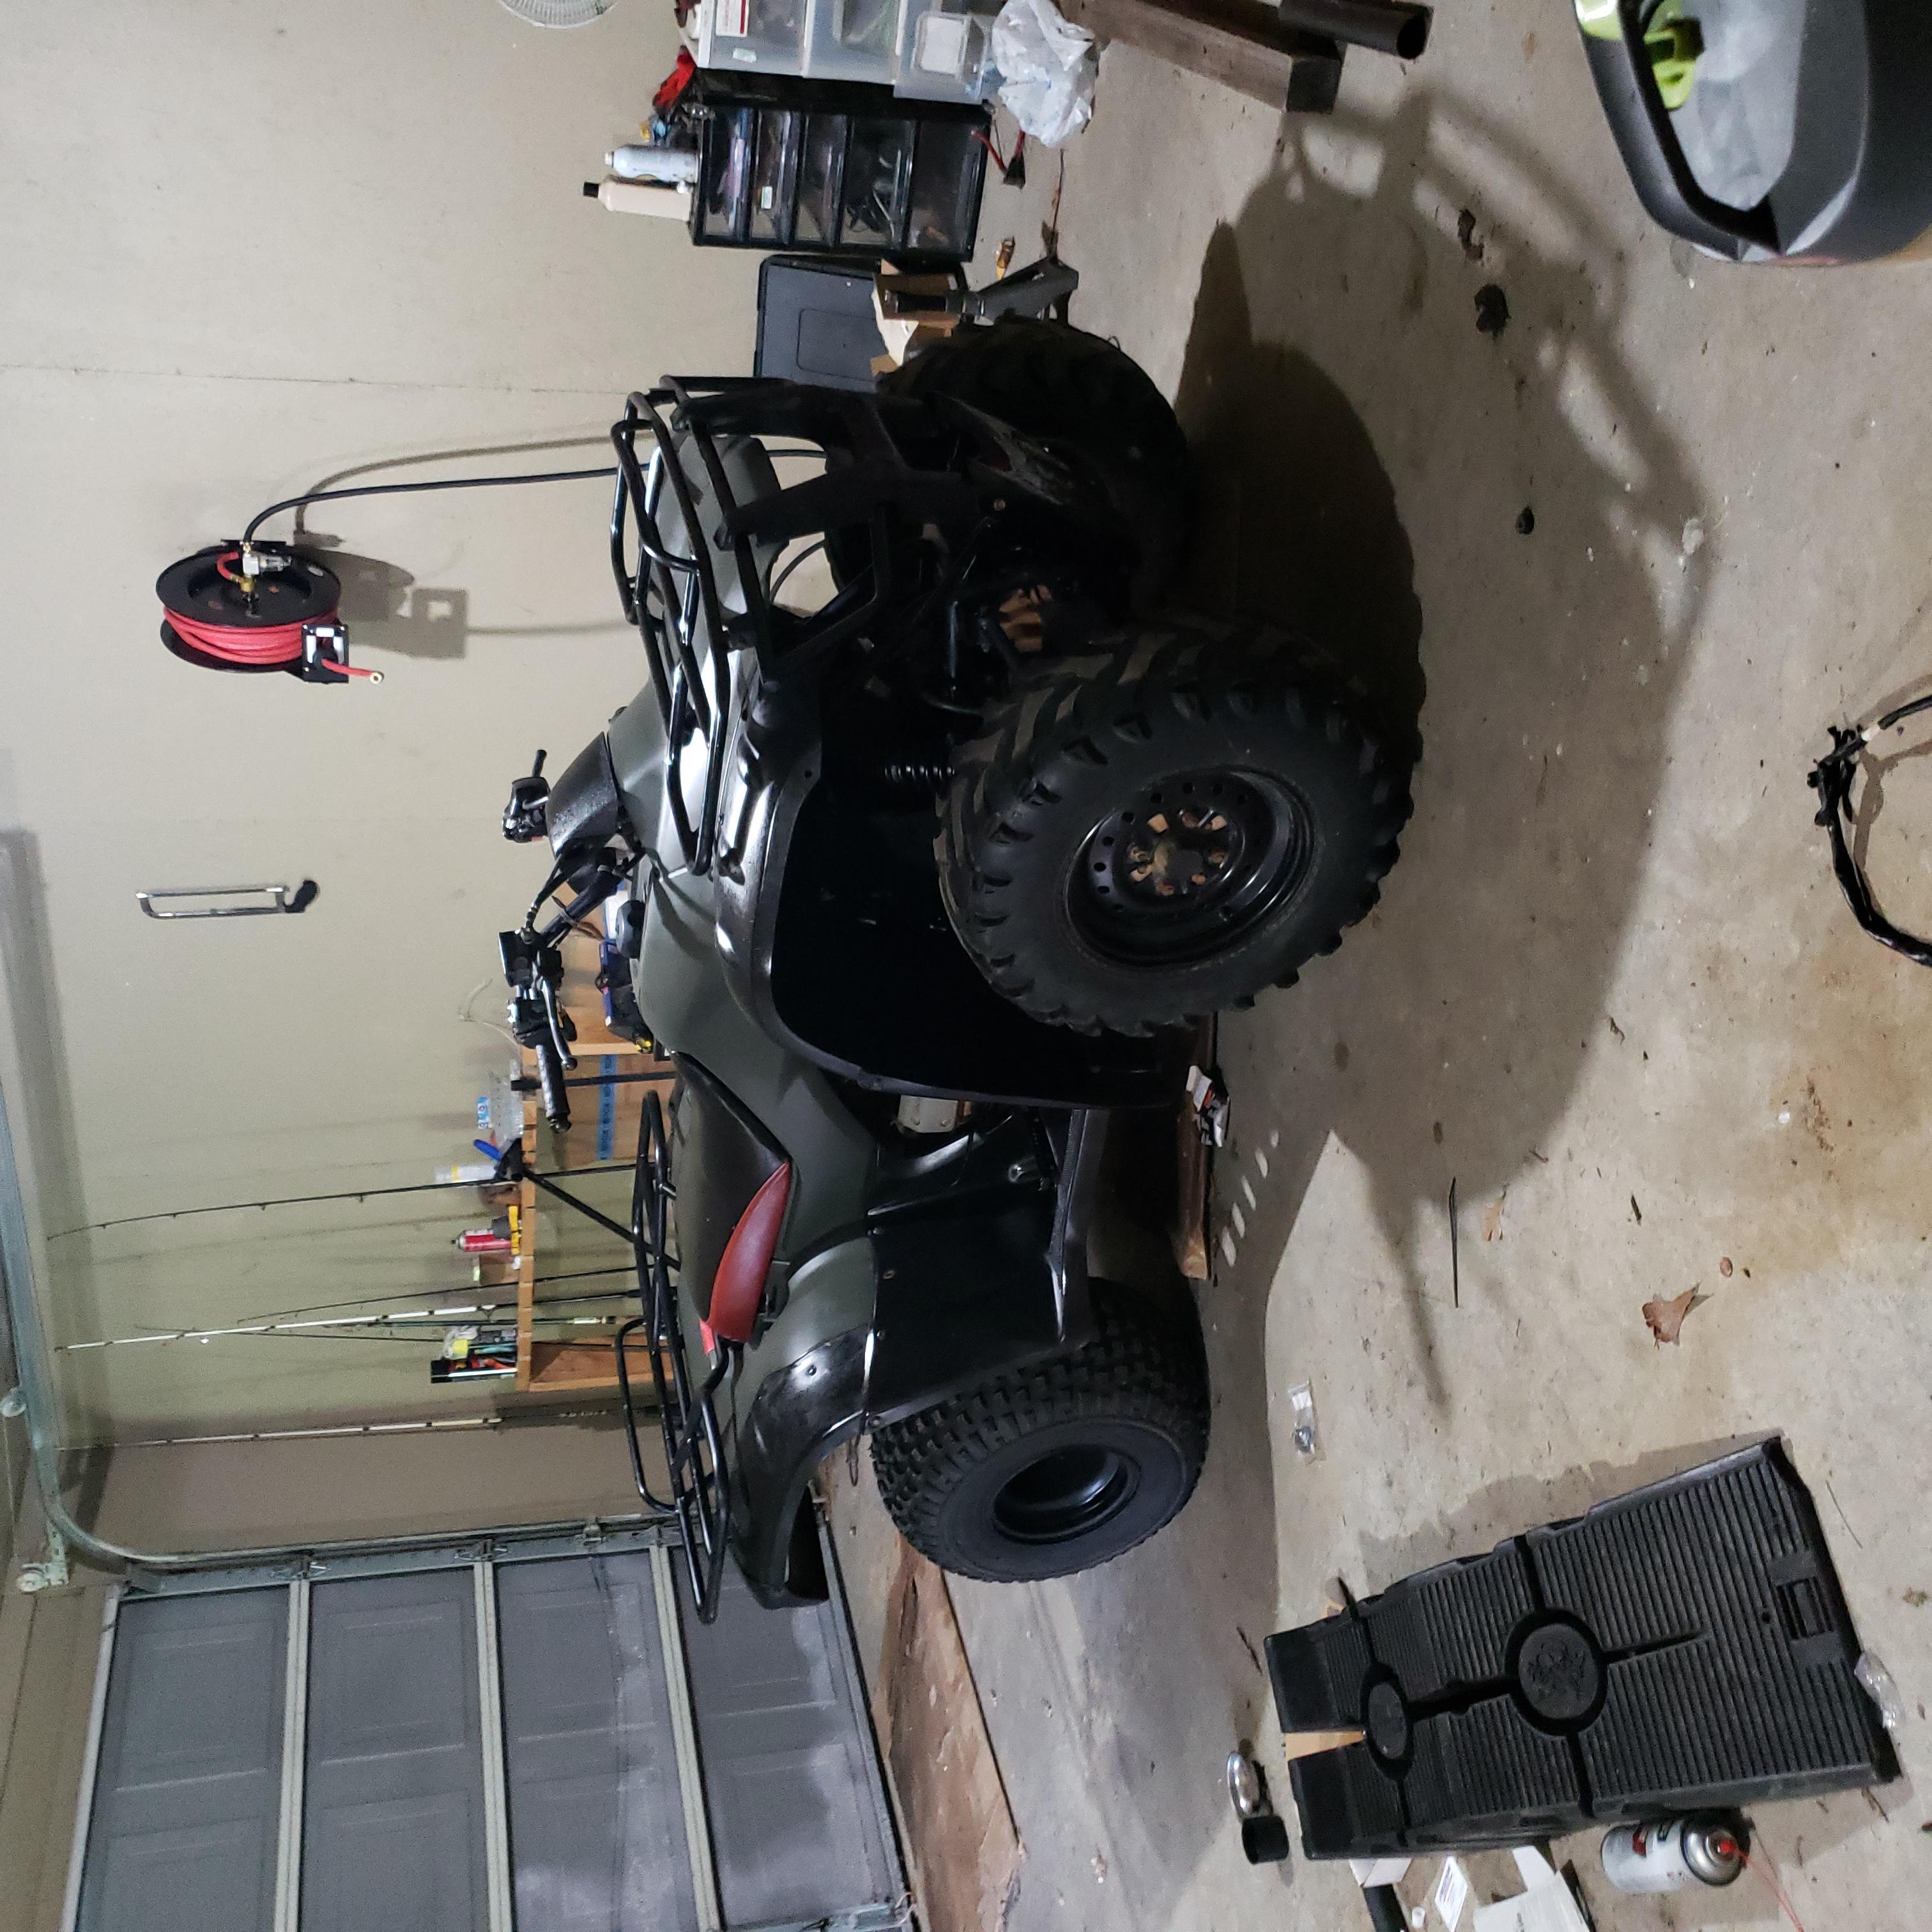 2005 Honda rancher 350 4x4 front drive shaft help-20190509_121930_1557505012849.jpg